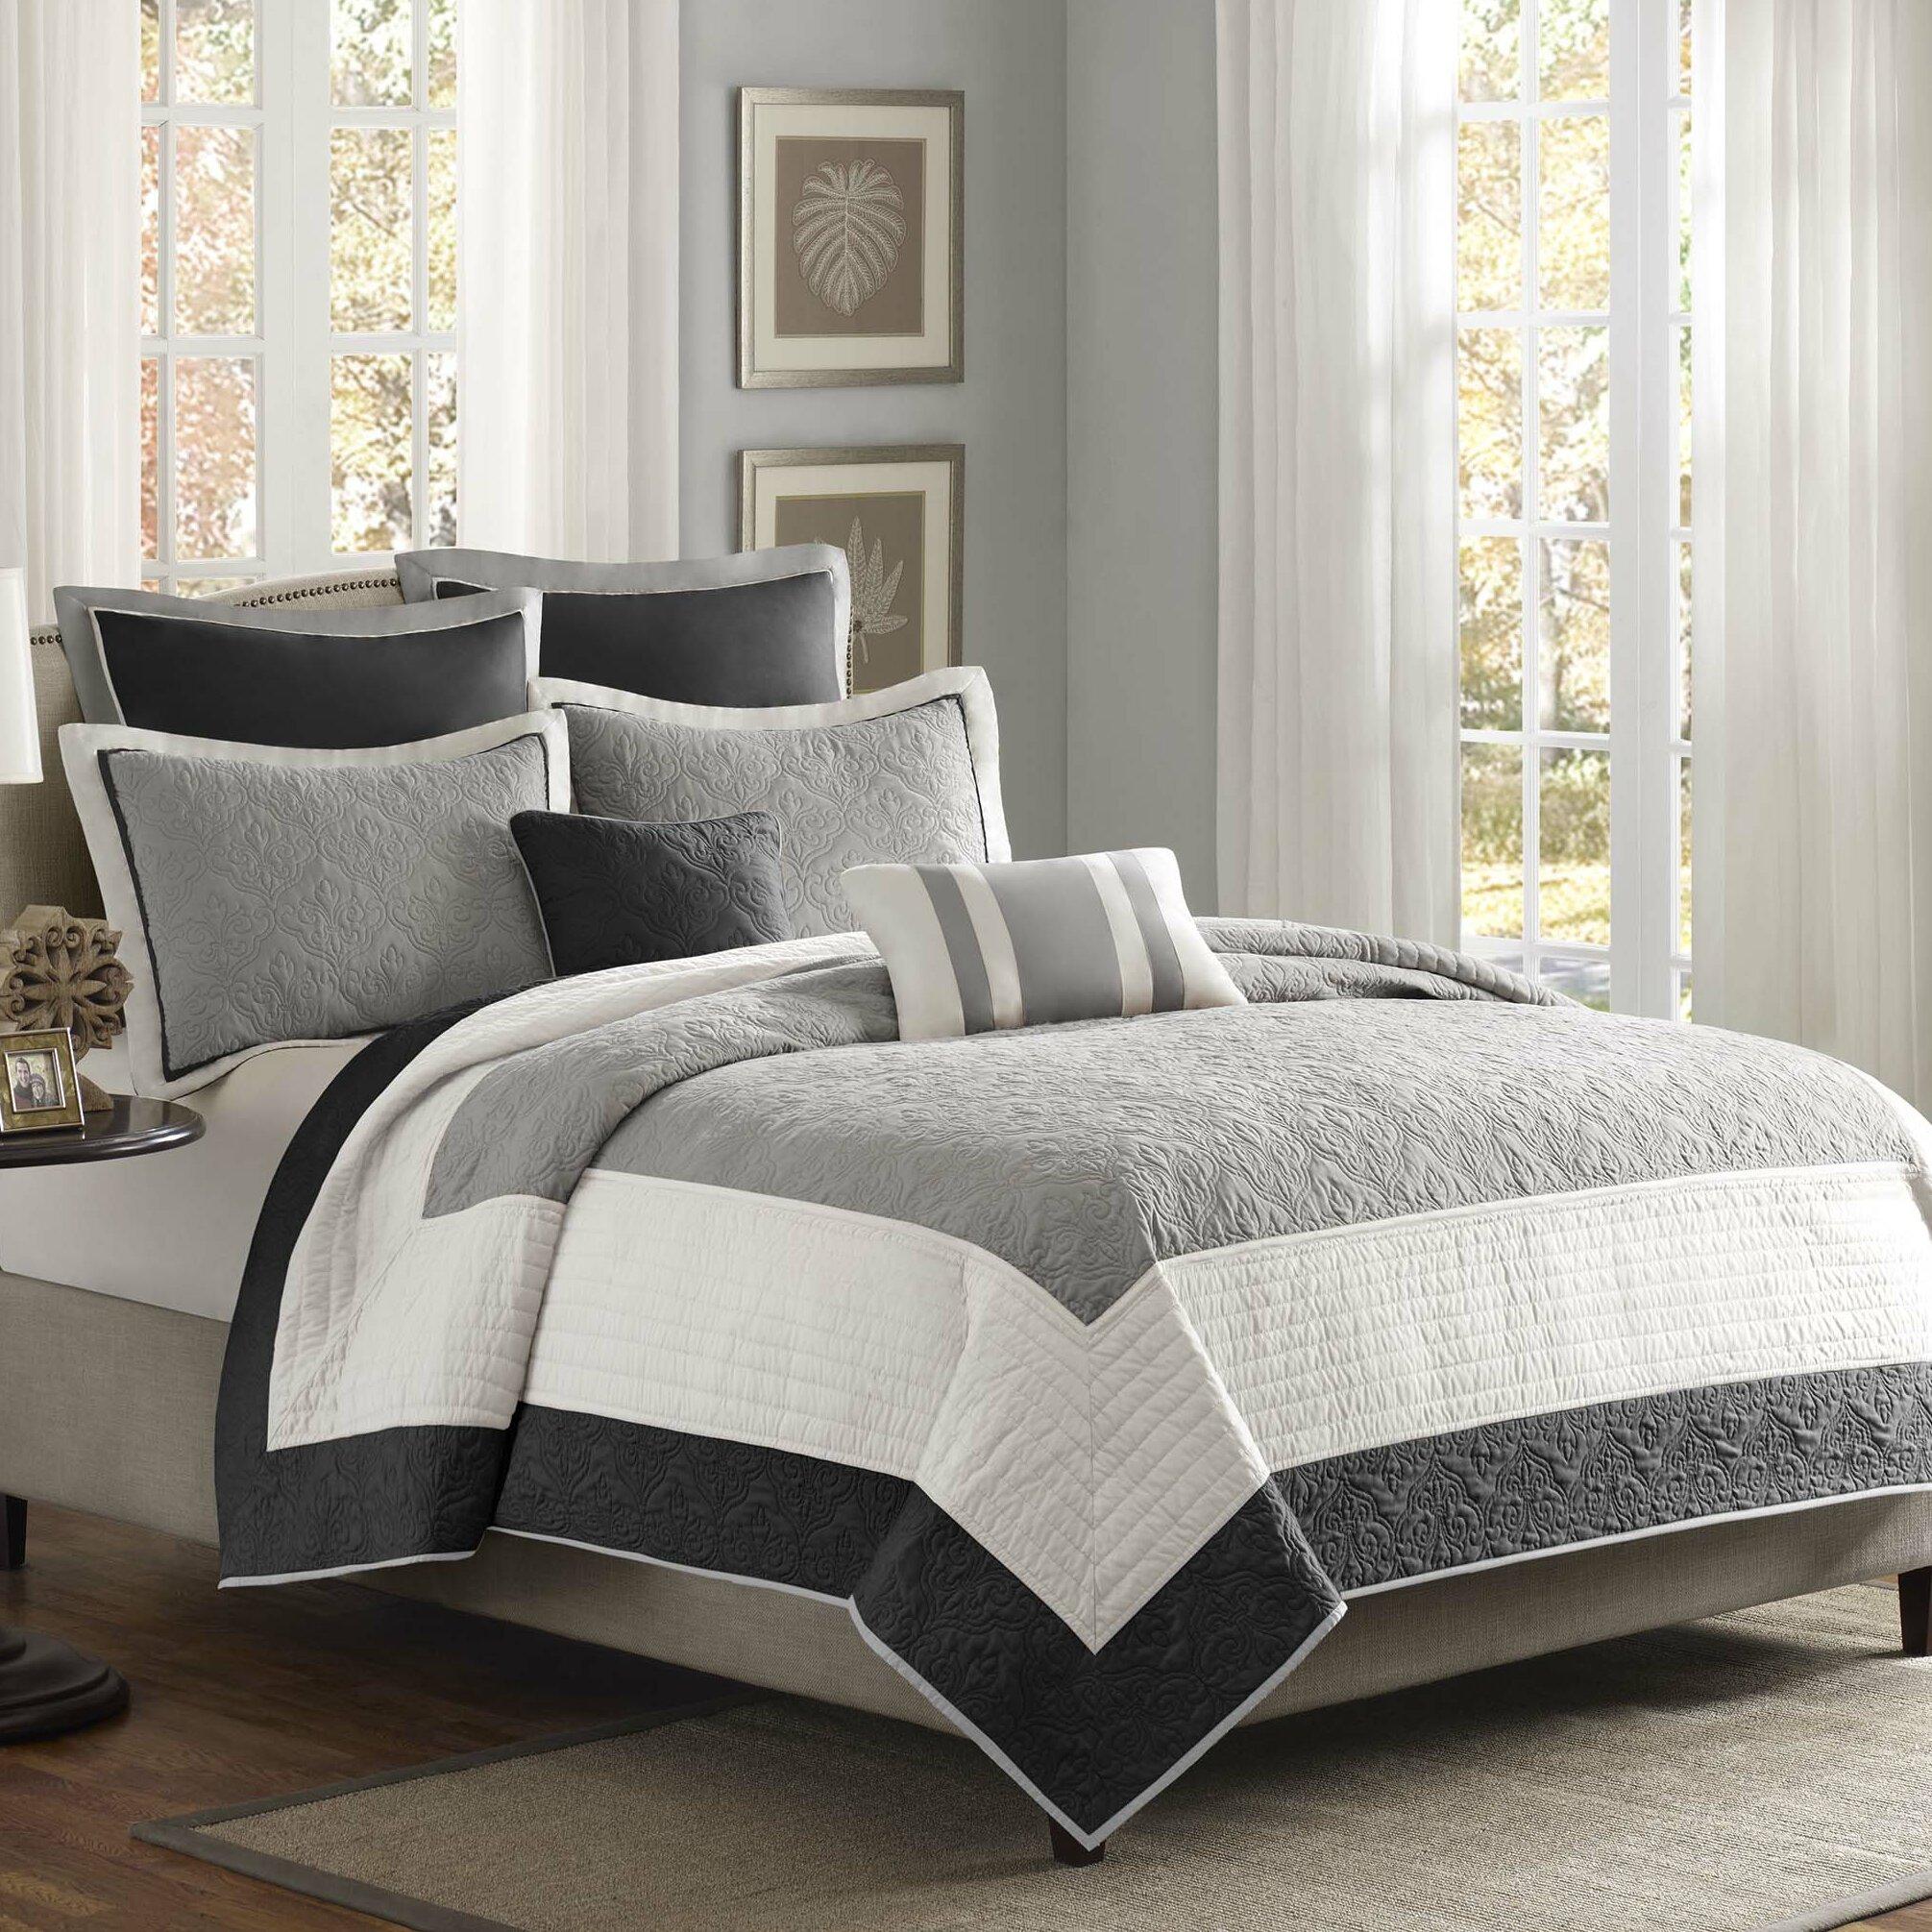 Posh Luxe Throw Blanket Bedding You Ll Love In 2019 Wayfair